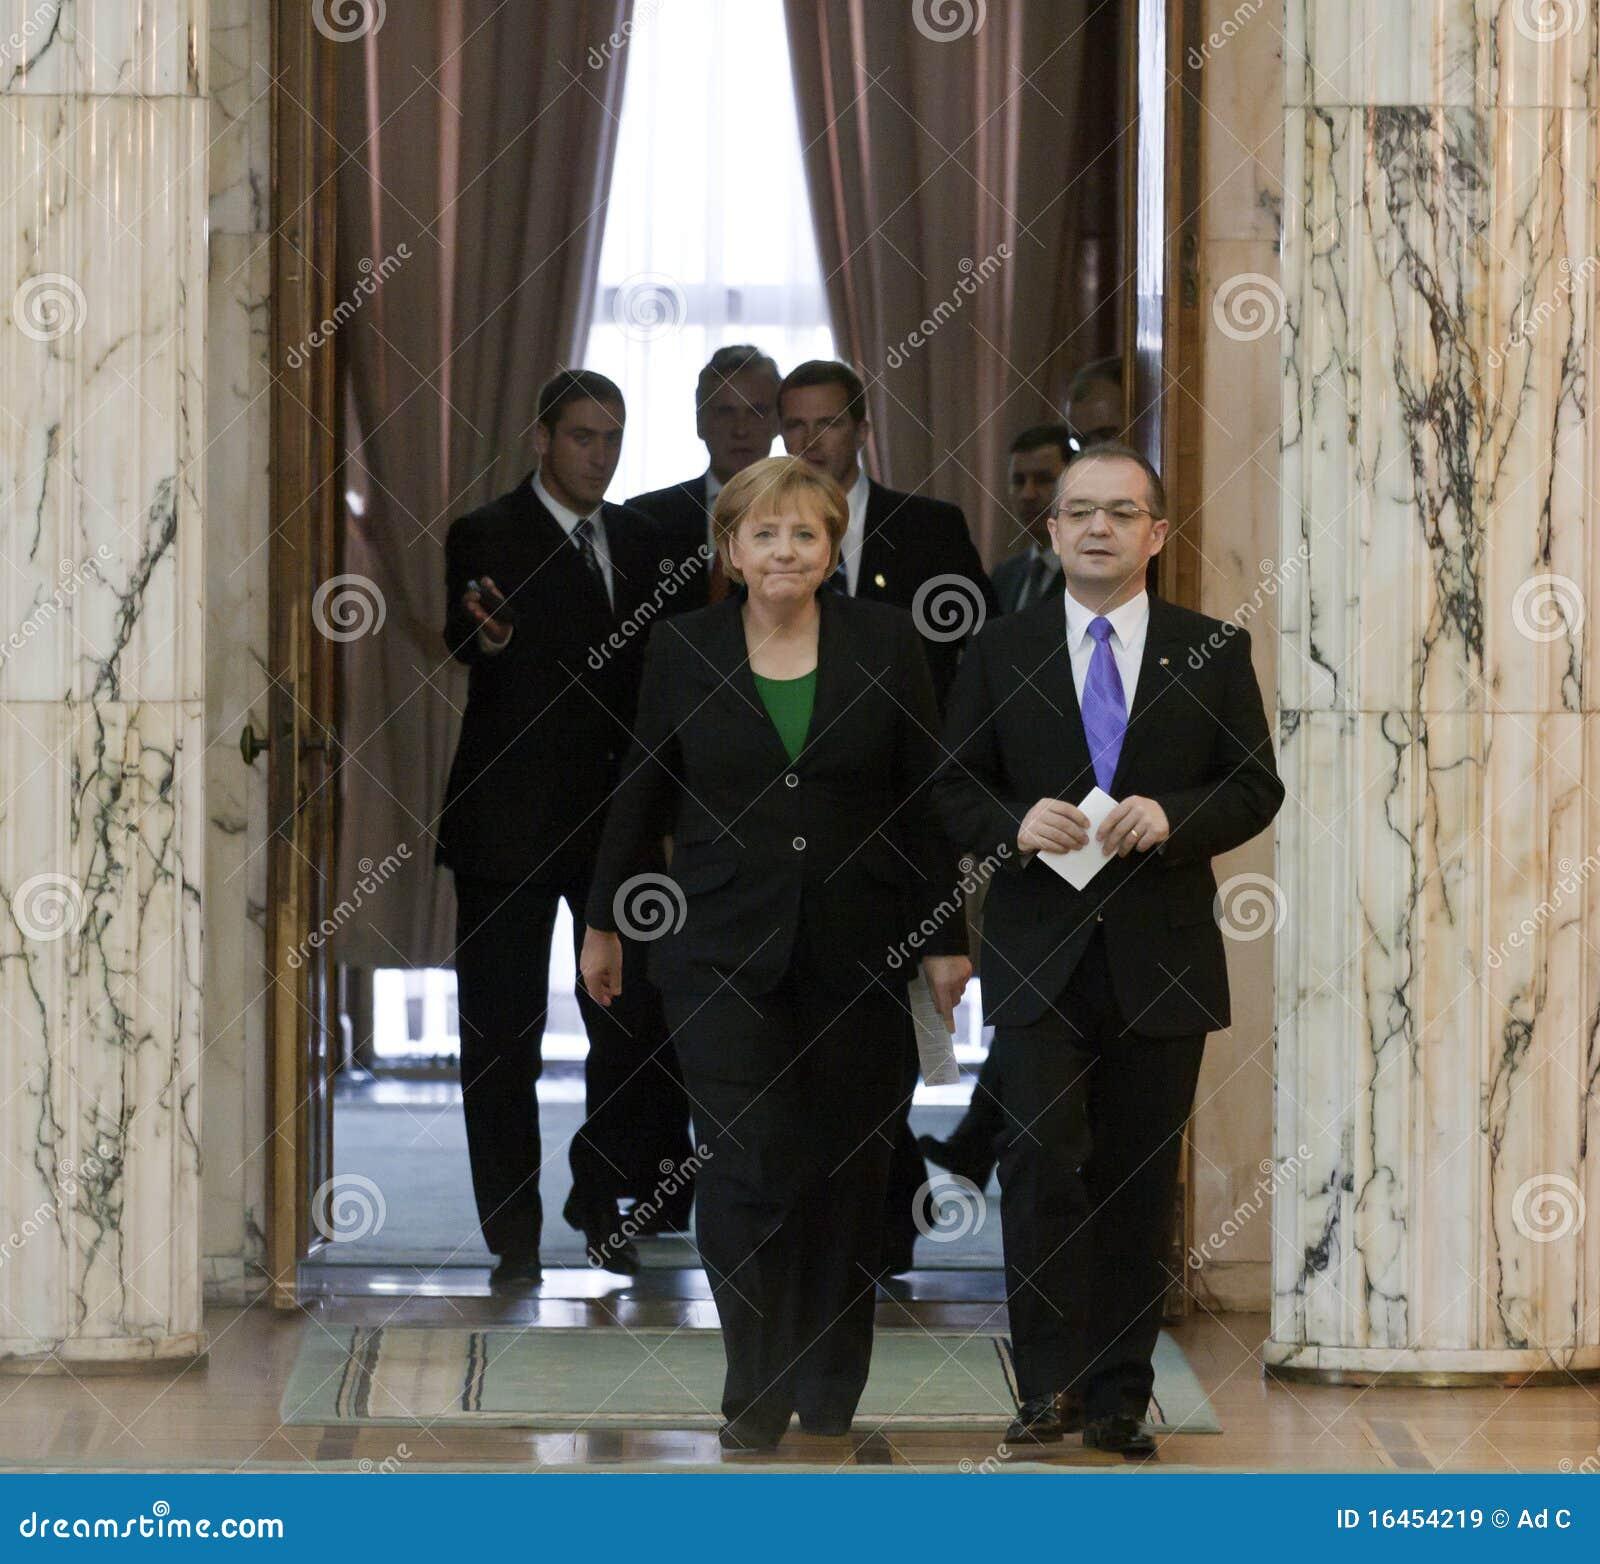 Emil Boc and Angela Merkel at Victoria Palace